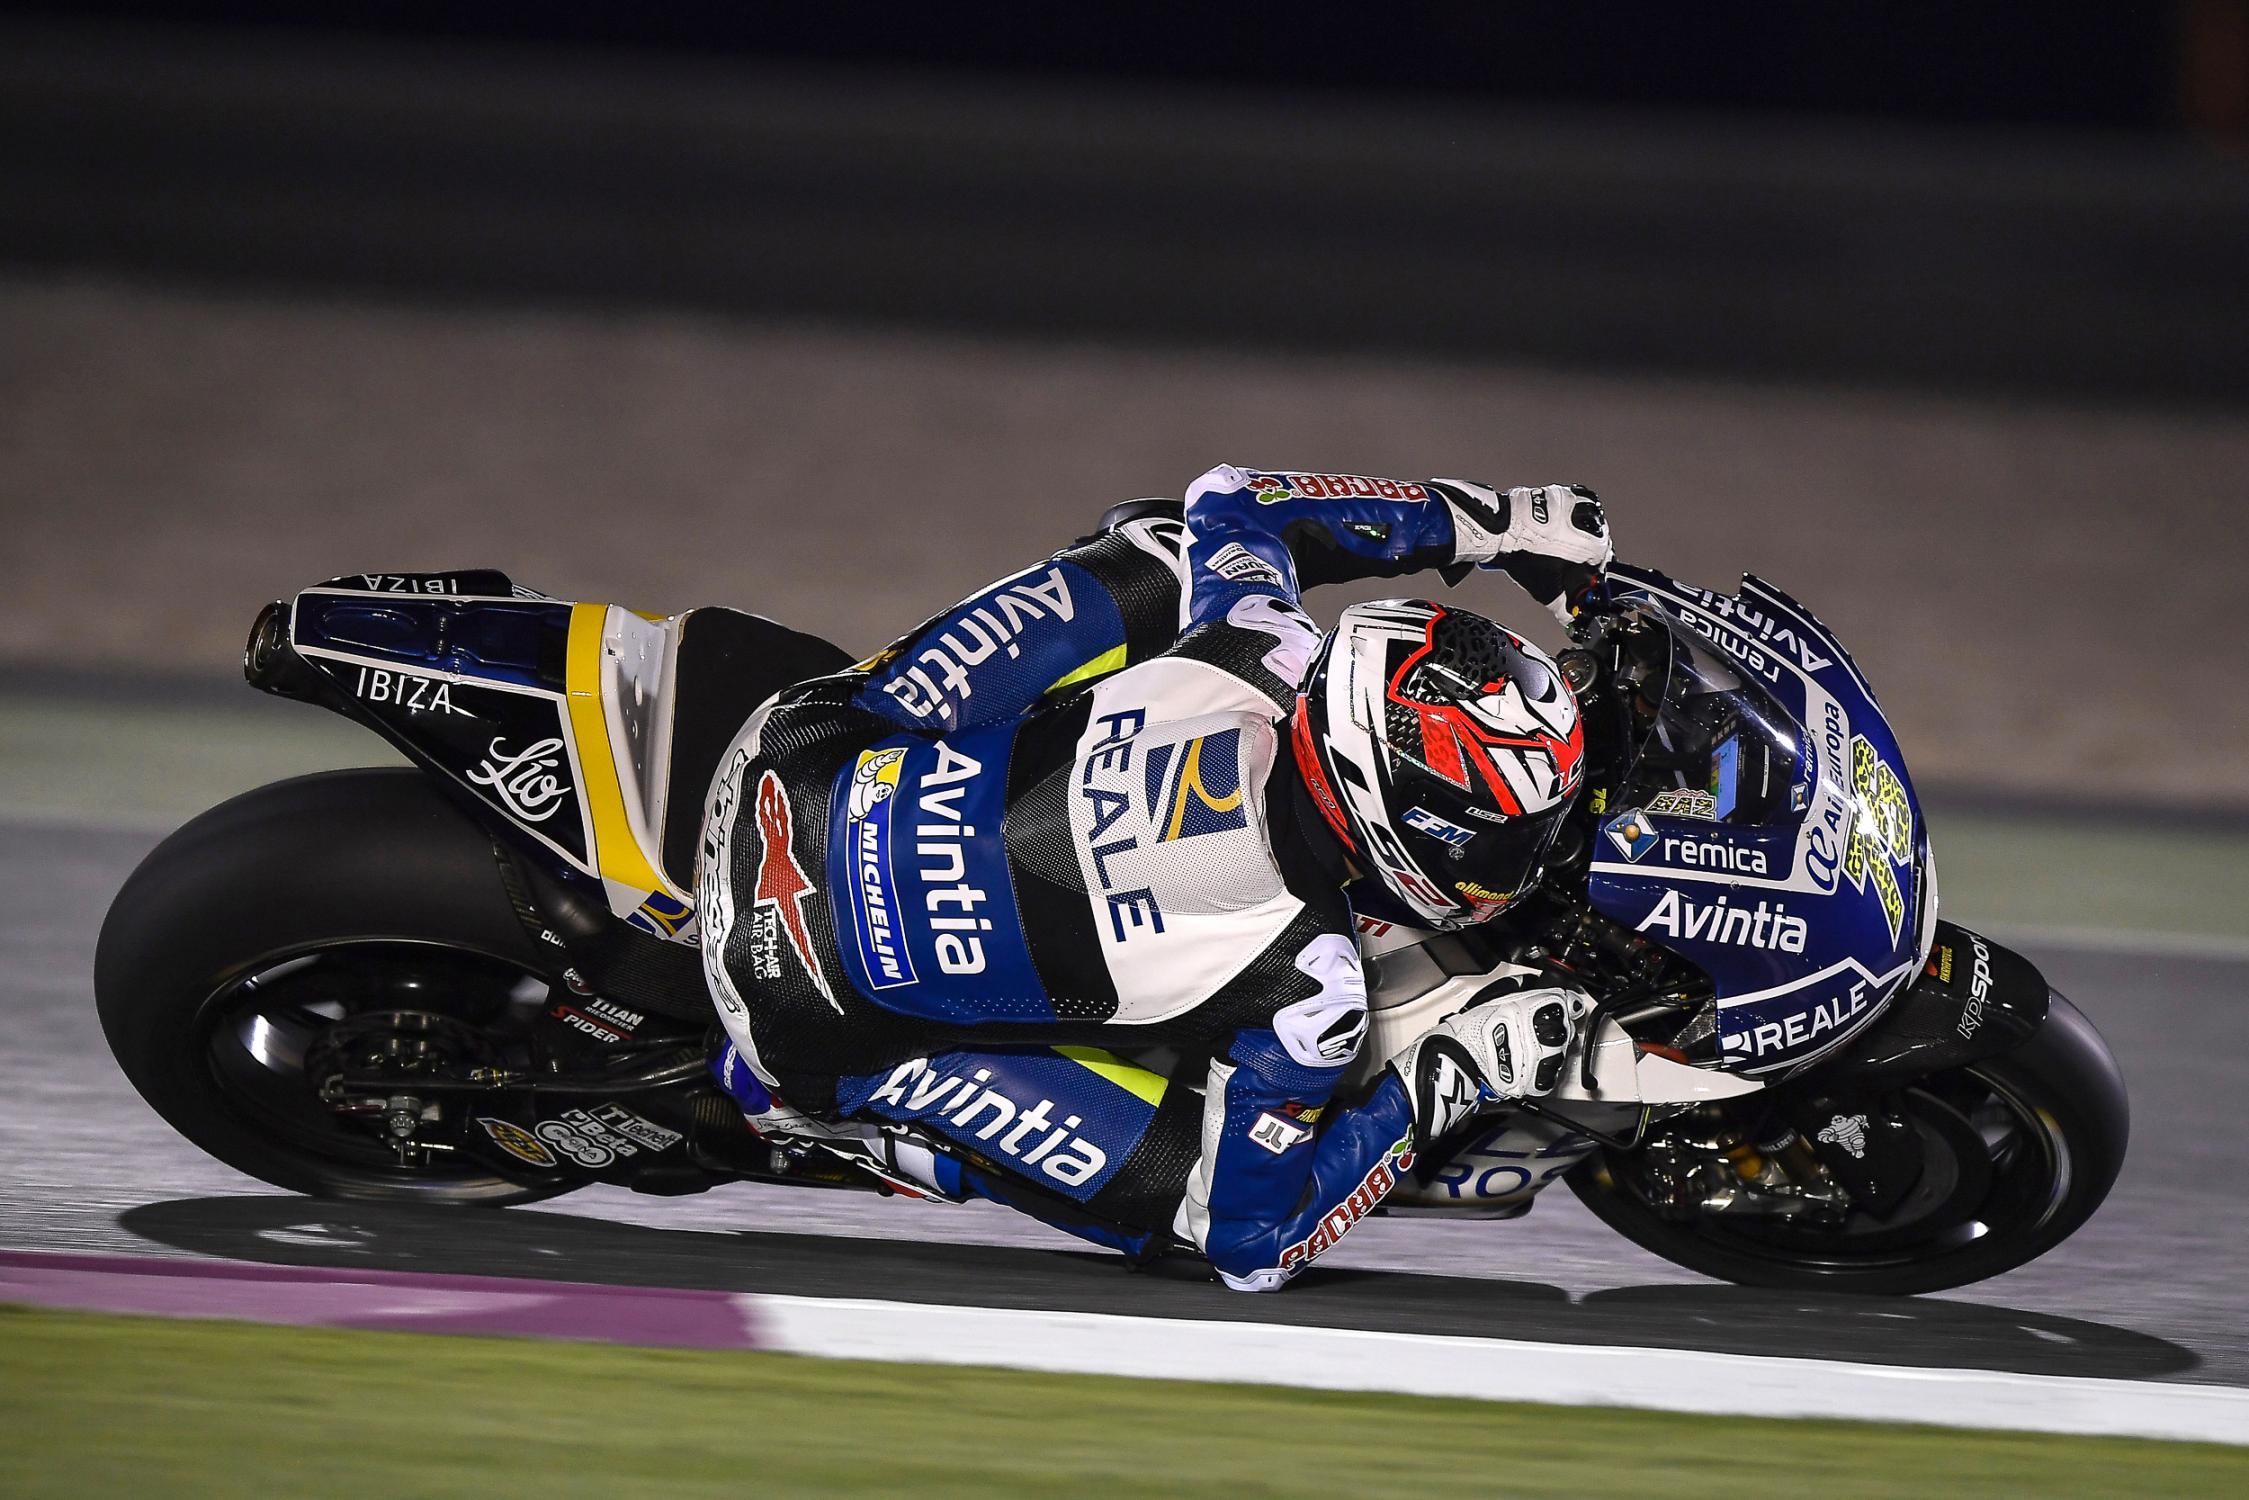 [MotoGP] Test Losail 76-loris-baz-fraclick-4.gallery_full_top_fullscreen